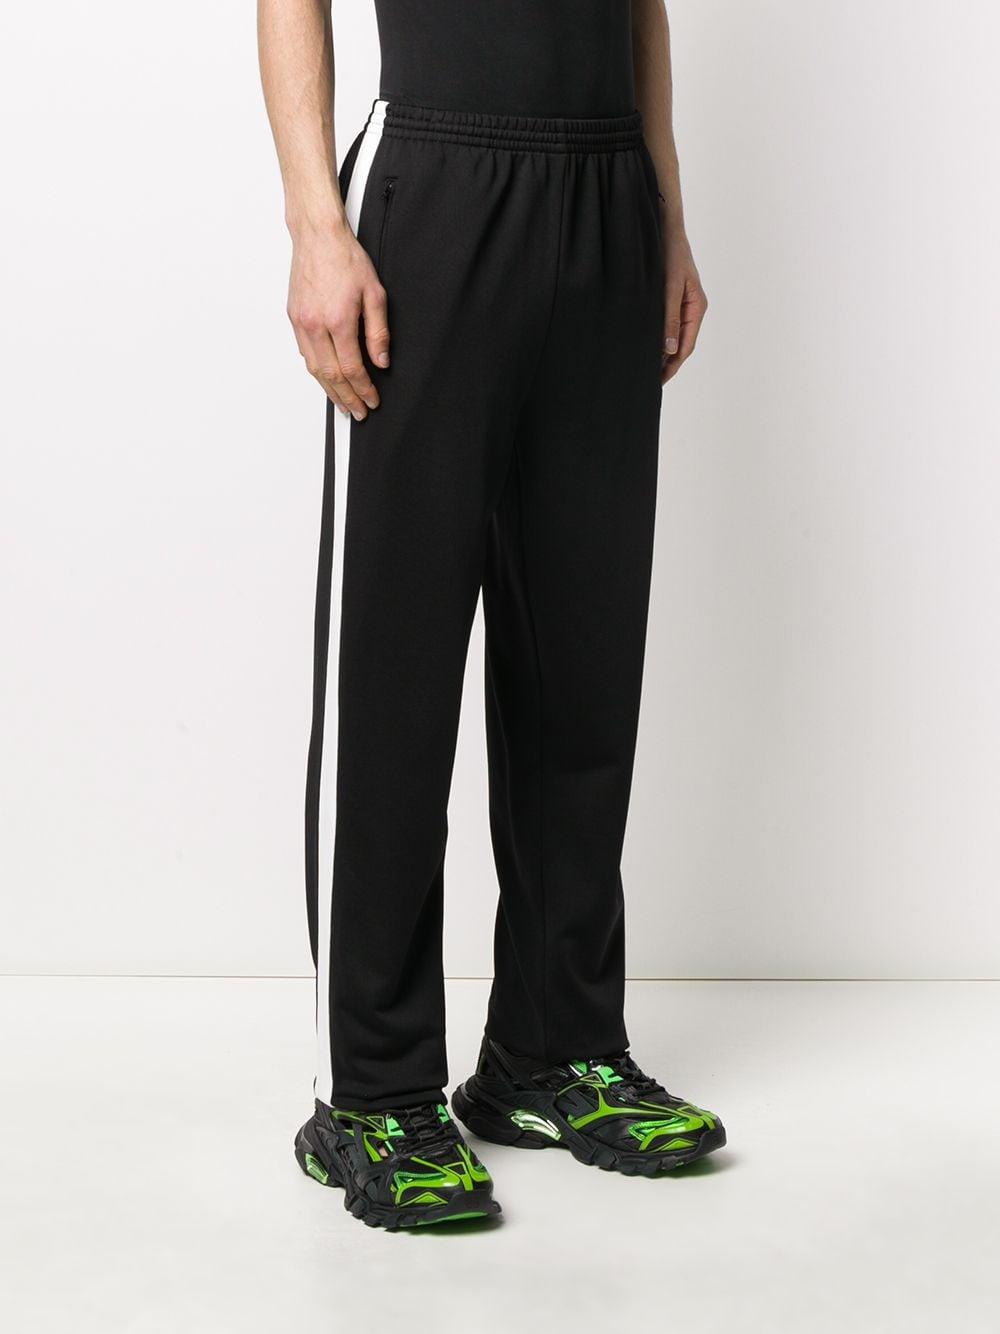 black track pants with side white stripe BALENCIAGA |  | 601609-TGV041070